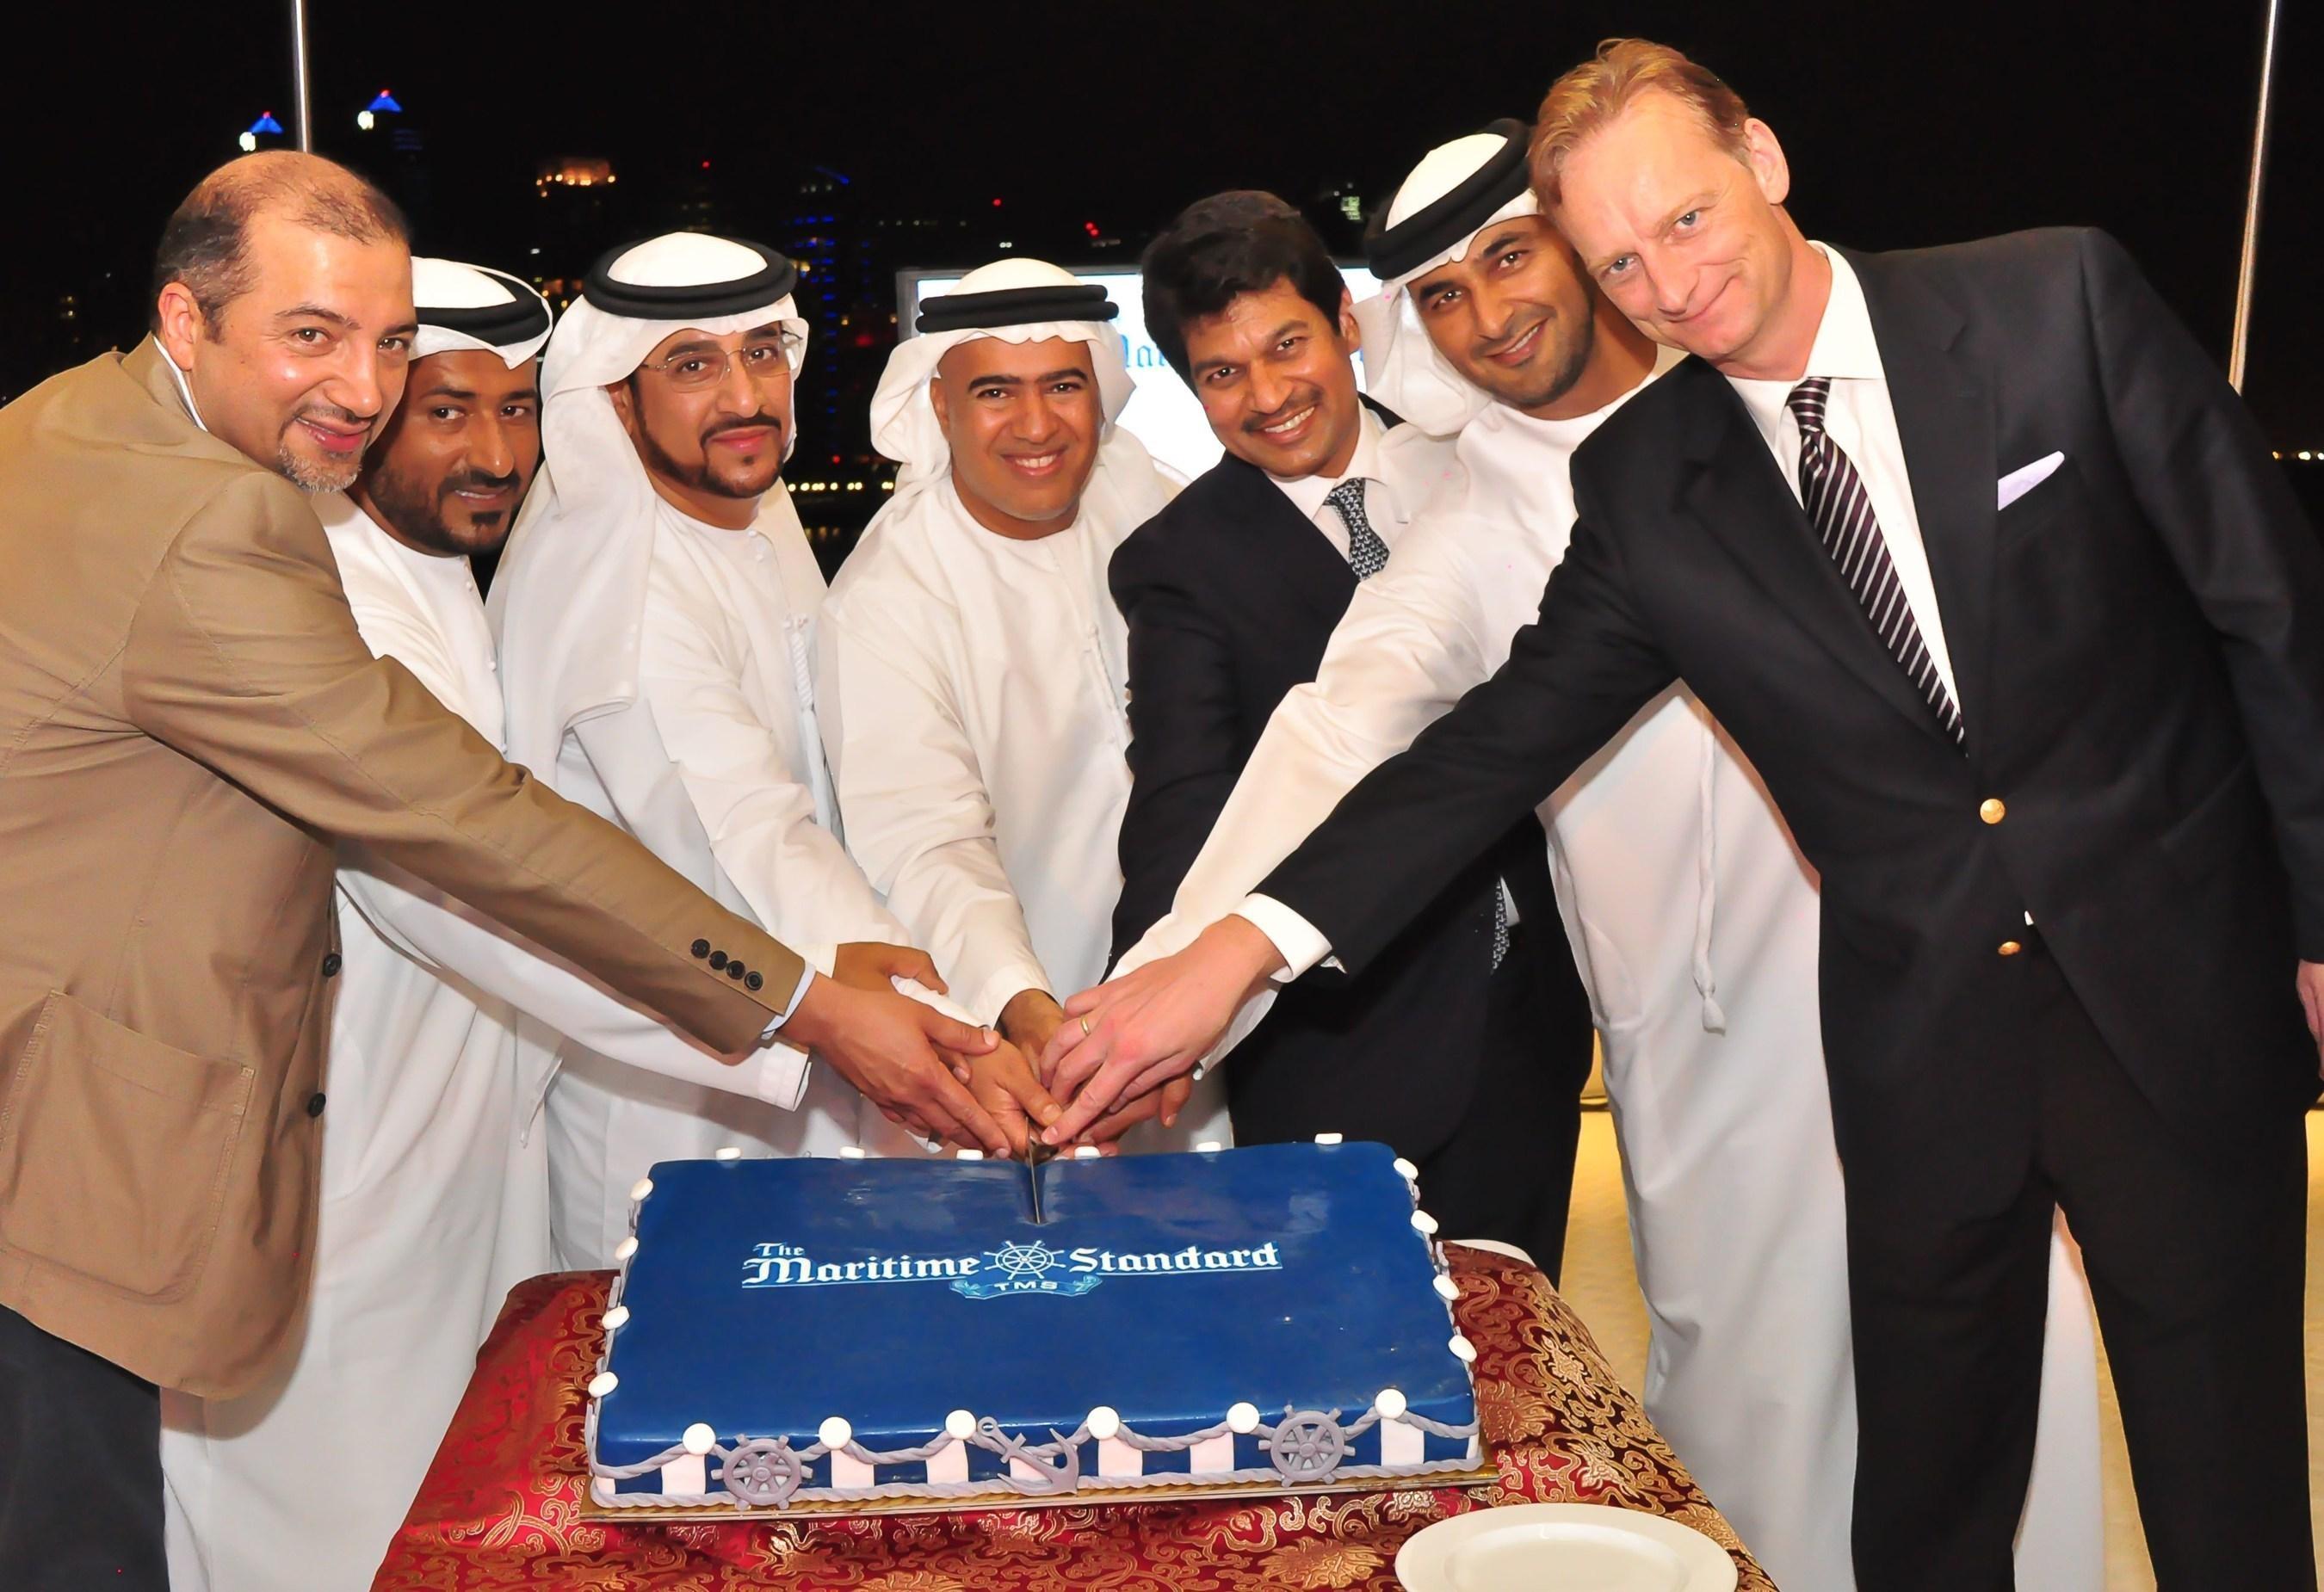 From left to right: Ali Shehab Ahmed, Deputy CEO, KOTC; Abdulla Salem Al Muharrami, CEO advisor, Abu Dhabi Port, H.E. Salem Al Zaabi; Dr. Ali Obaid Al Yabhouni, Former CEO ADNATCO NGSCO; Trevor Pereira, Managing Director, The Maritime Standard; Abdulkareem Mubarak Ahmed Al Masabi, Chairman, Abu Dhabi Terminals; Thomas Kriwat, Chief Executive, Mercmarine Group of Comapnies (PRNewsFoto/Flagship Events)